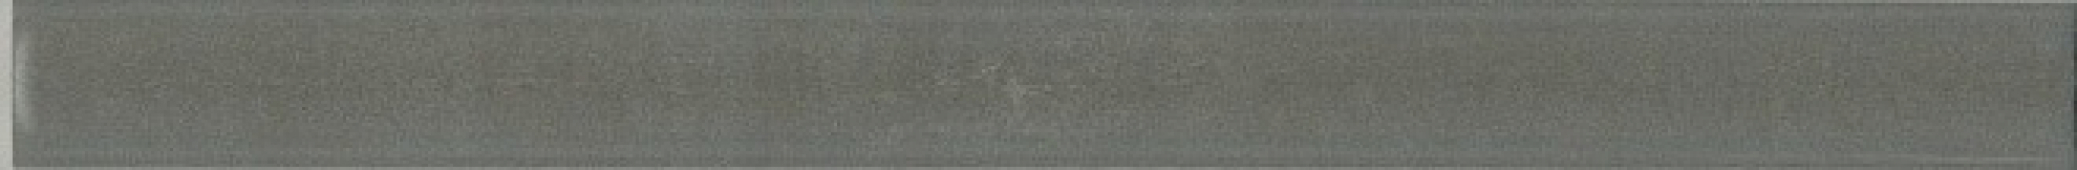 Бордюр Раваль серый обрезной 30х2,5х19